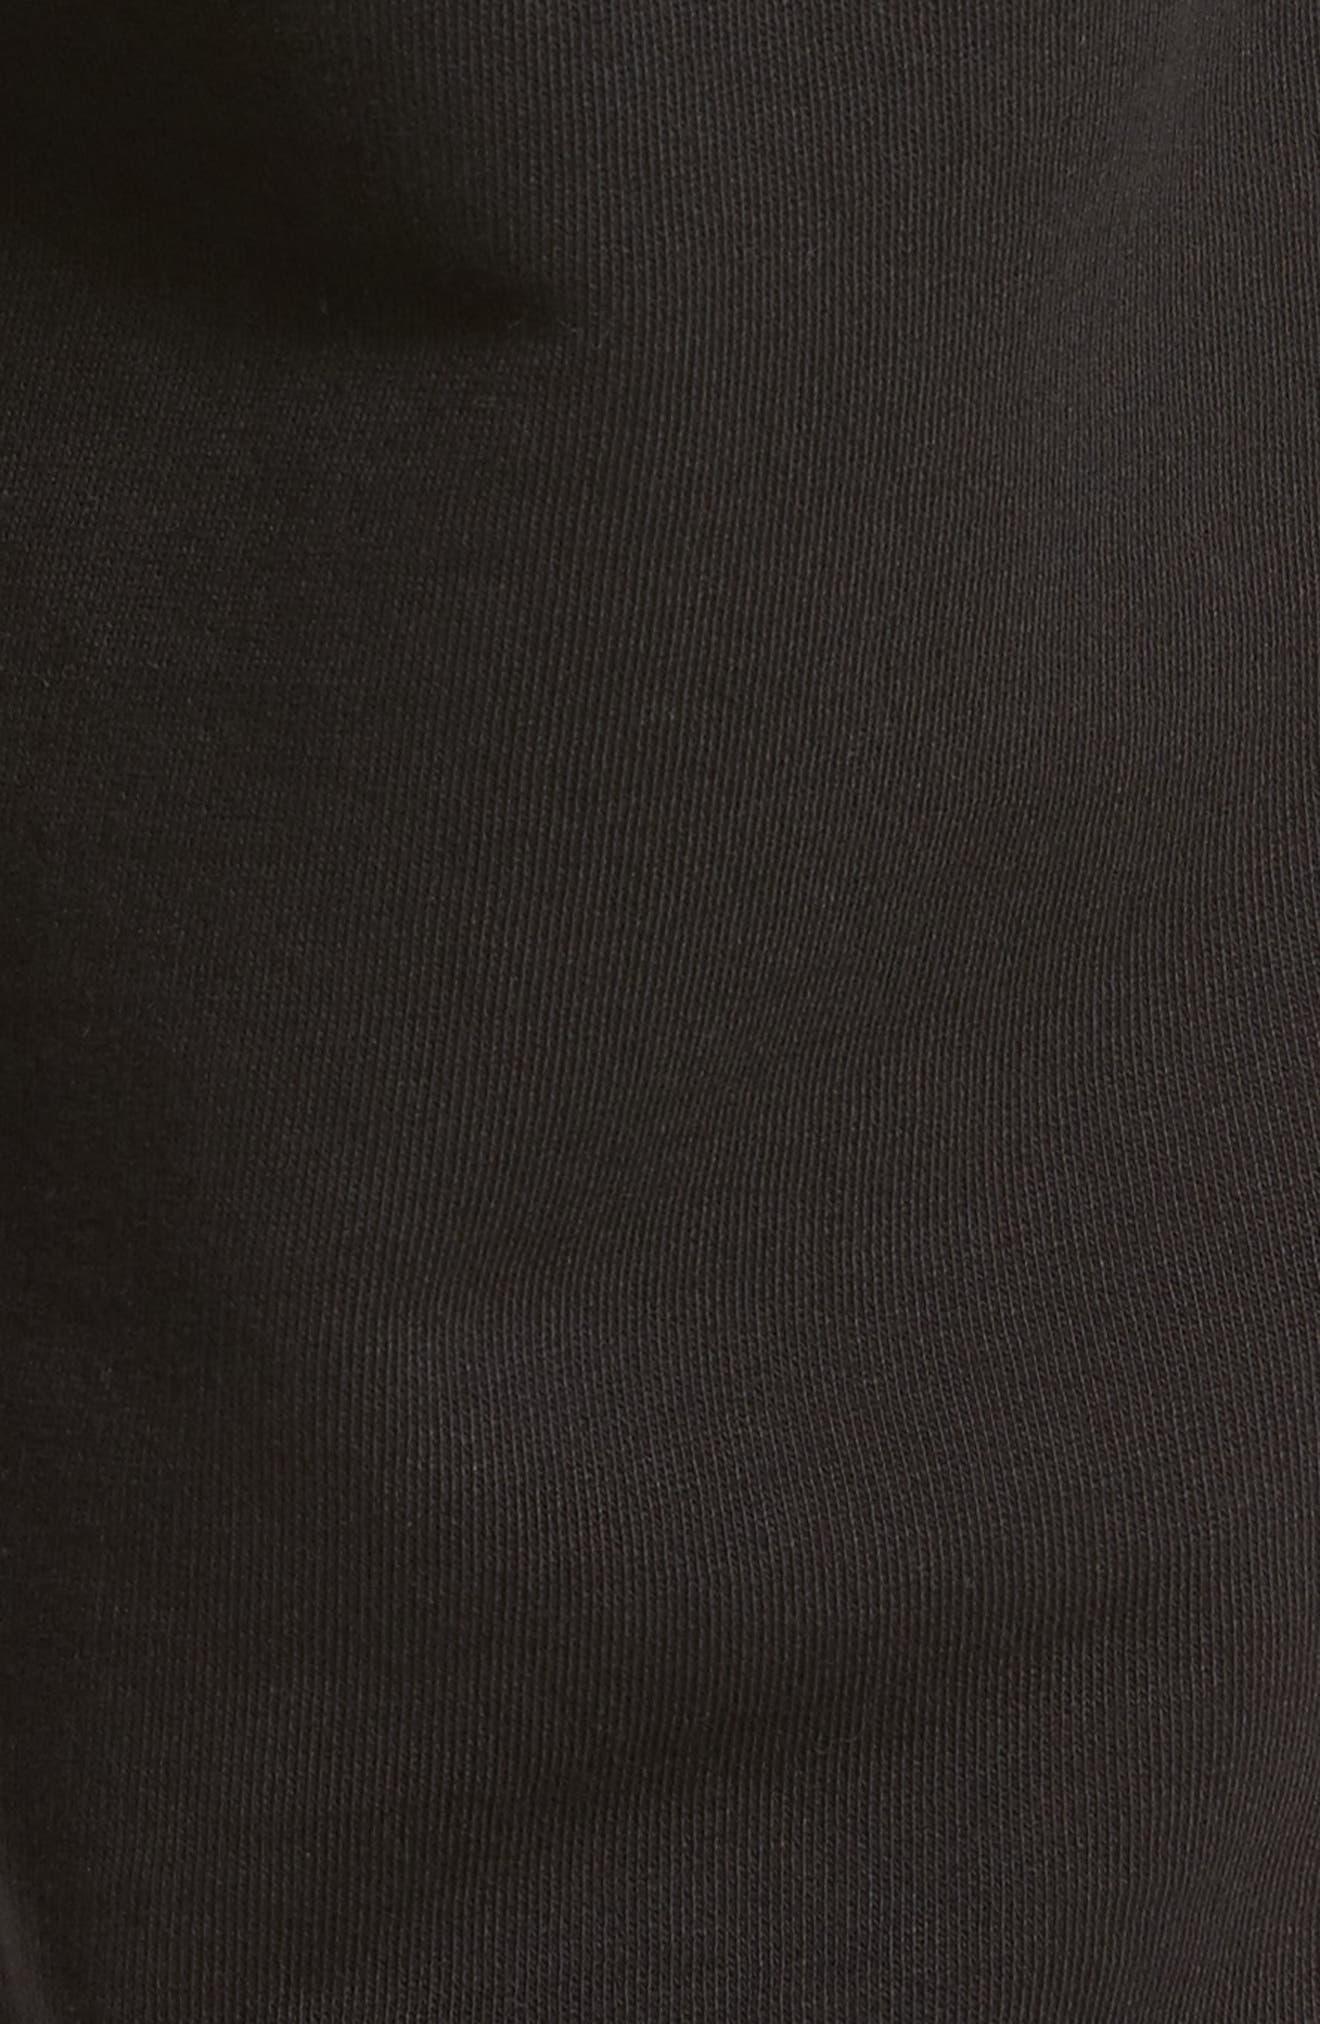 Stripe Athletic Shorts,                             Alternate thumbnail 5, color,                             010